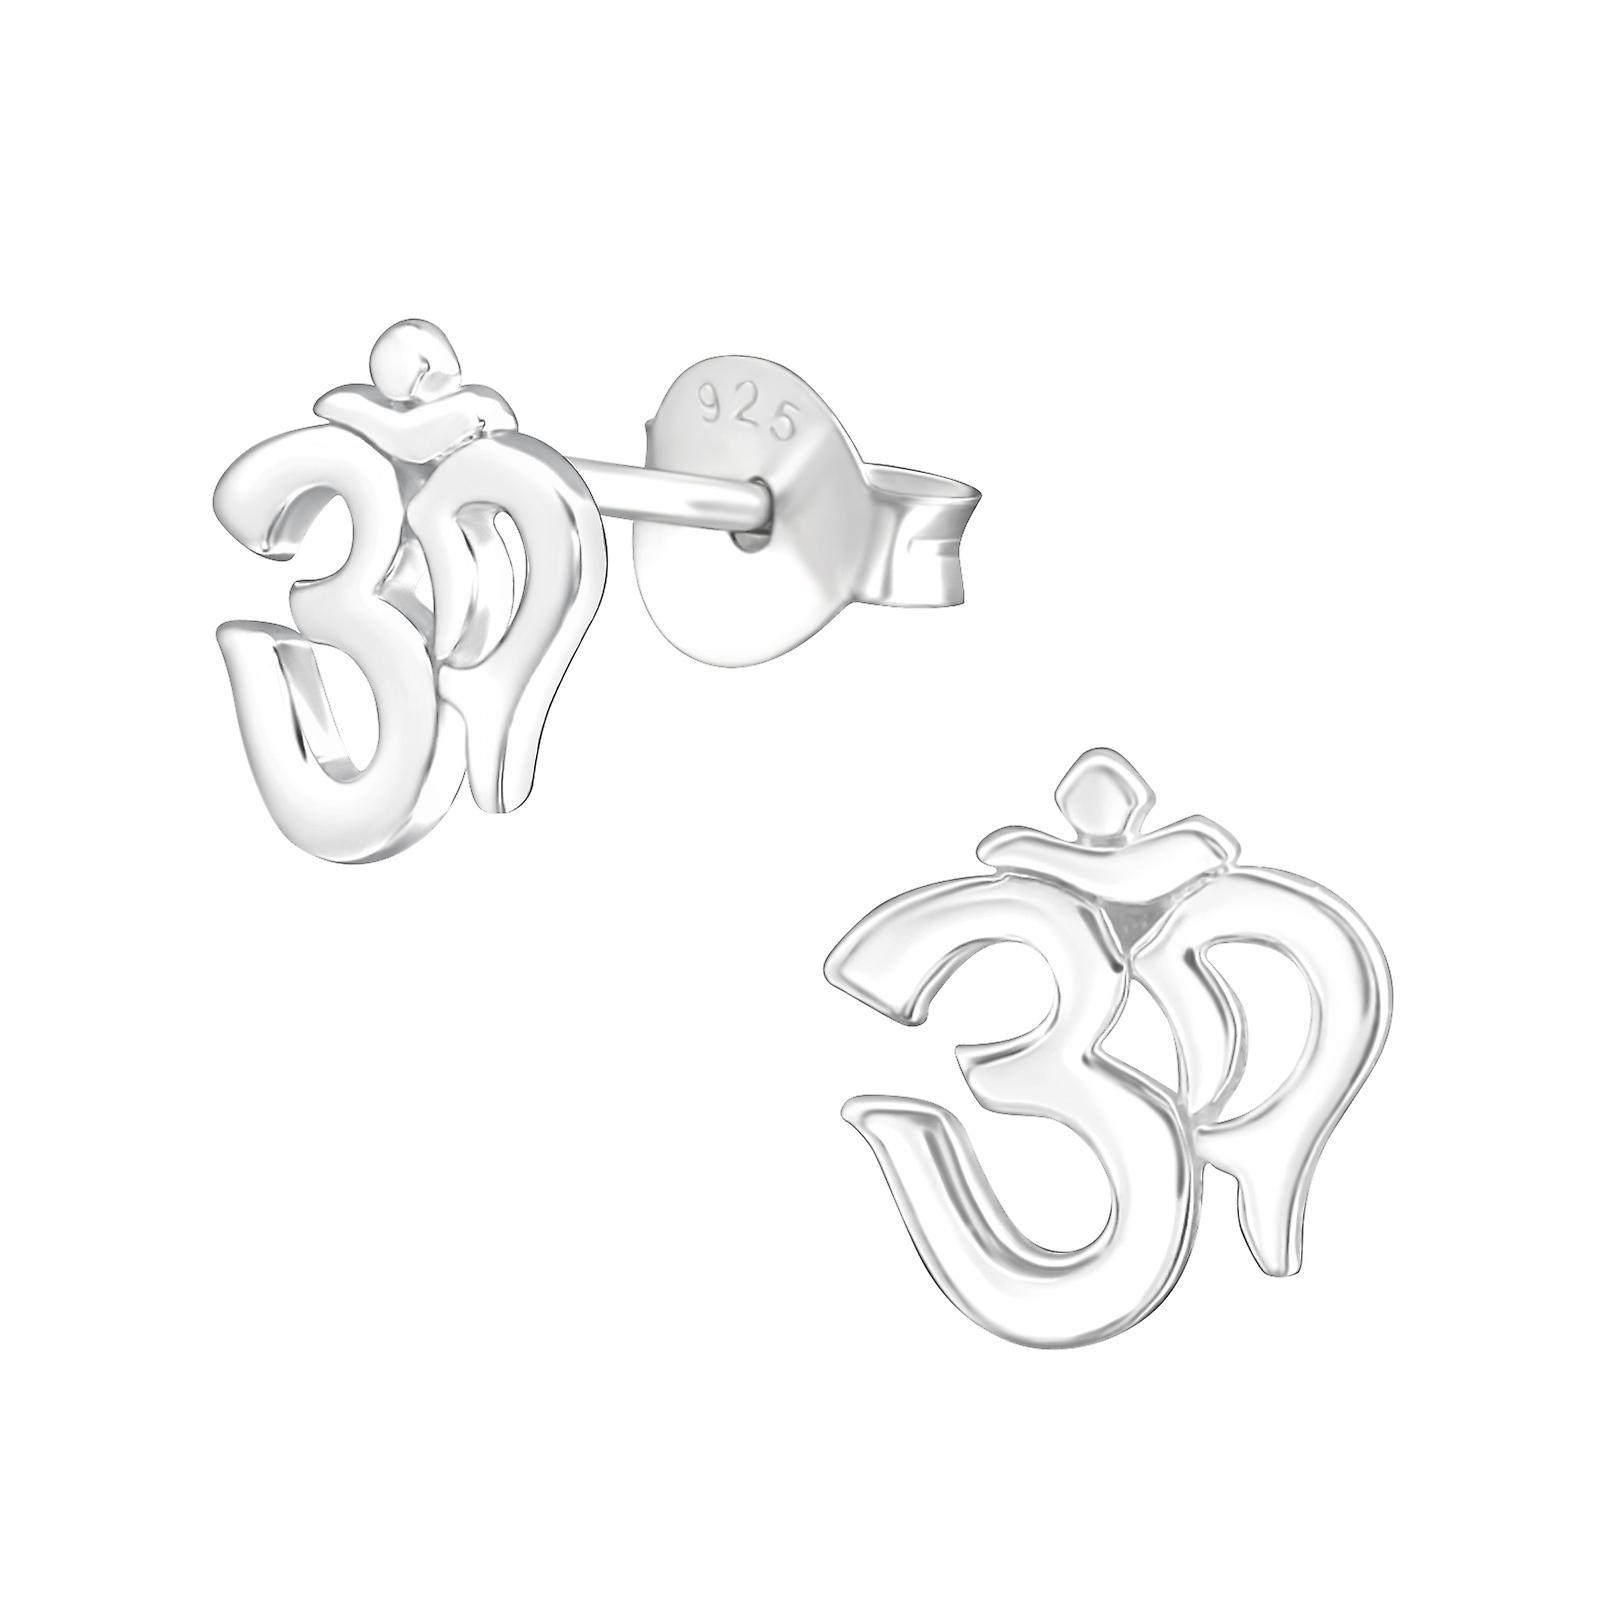 Om Symbol - 925 Sterling Silver Plain Ear Studs - W37748x